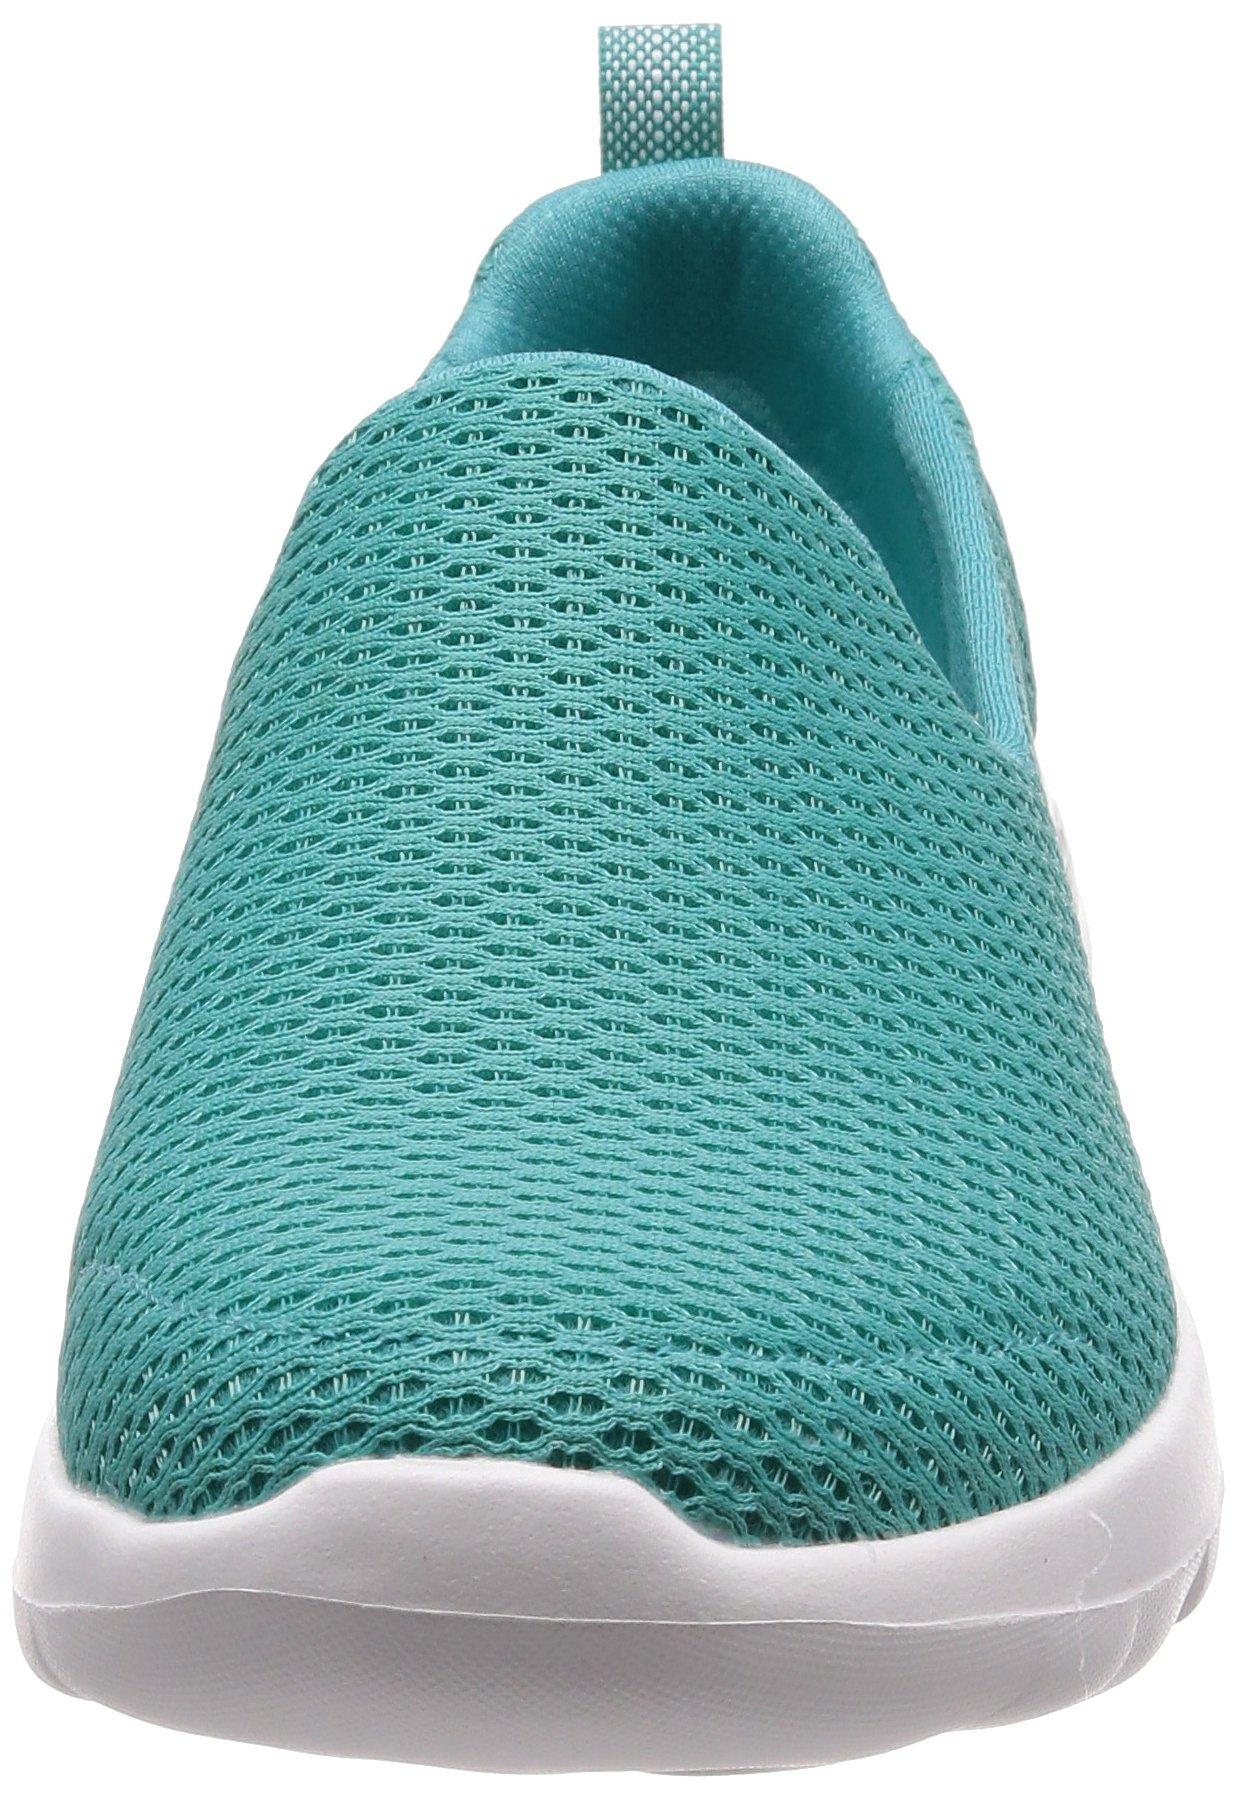 Skechers Womens GO Joy Slip ON Turquoise Size 5 by Skechers (Image #4)